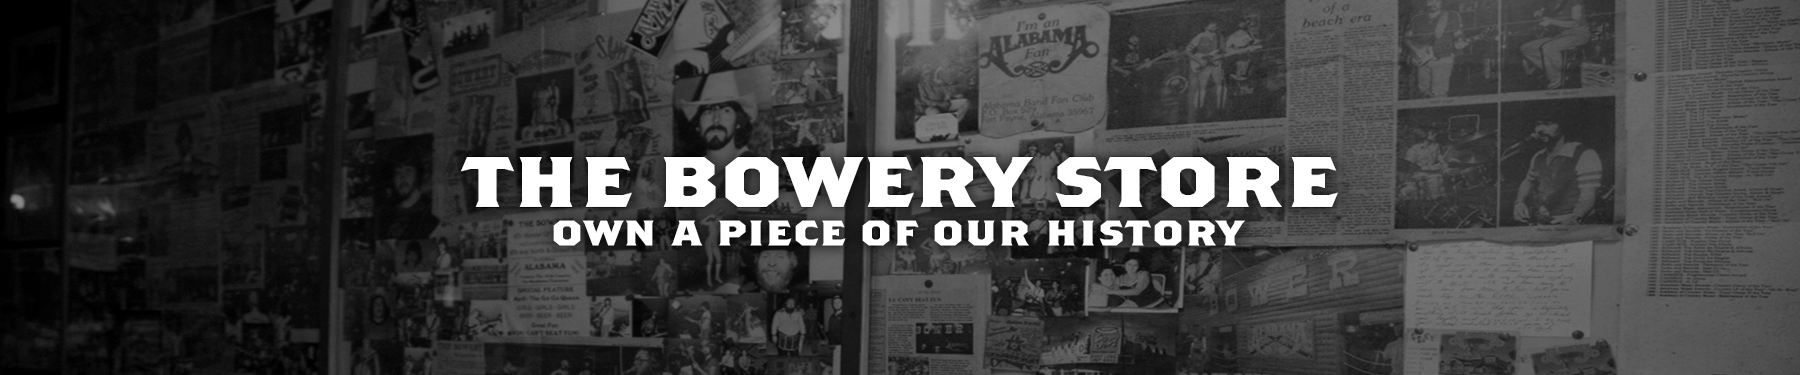 Myrtle Beach Bar